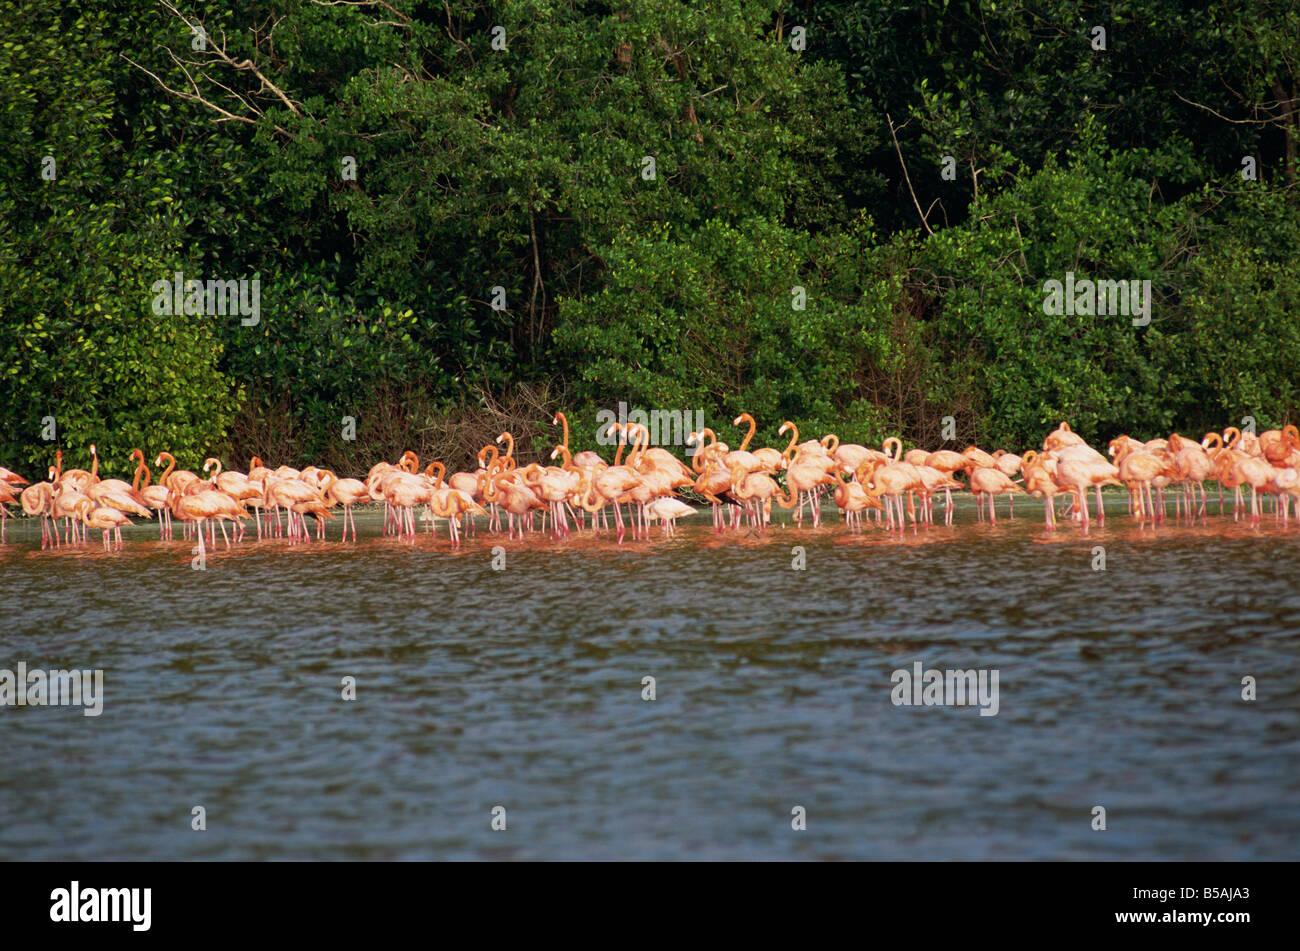 Flamingos, Celestun National Wildlife Refuge, Celestun, Yucatan, Mexico, North America - Stock Image